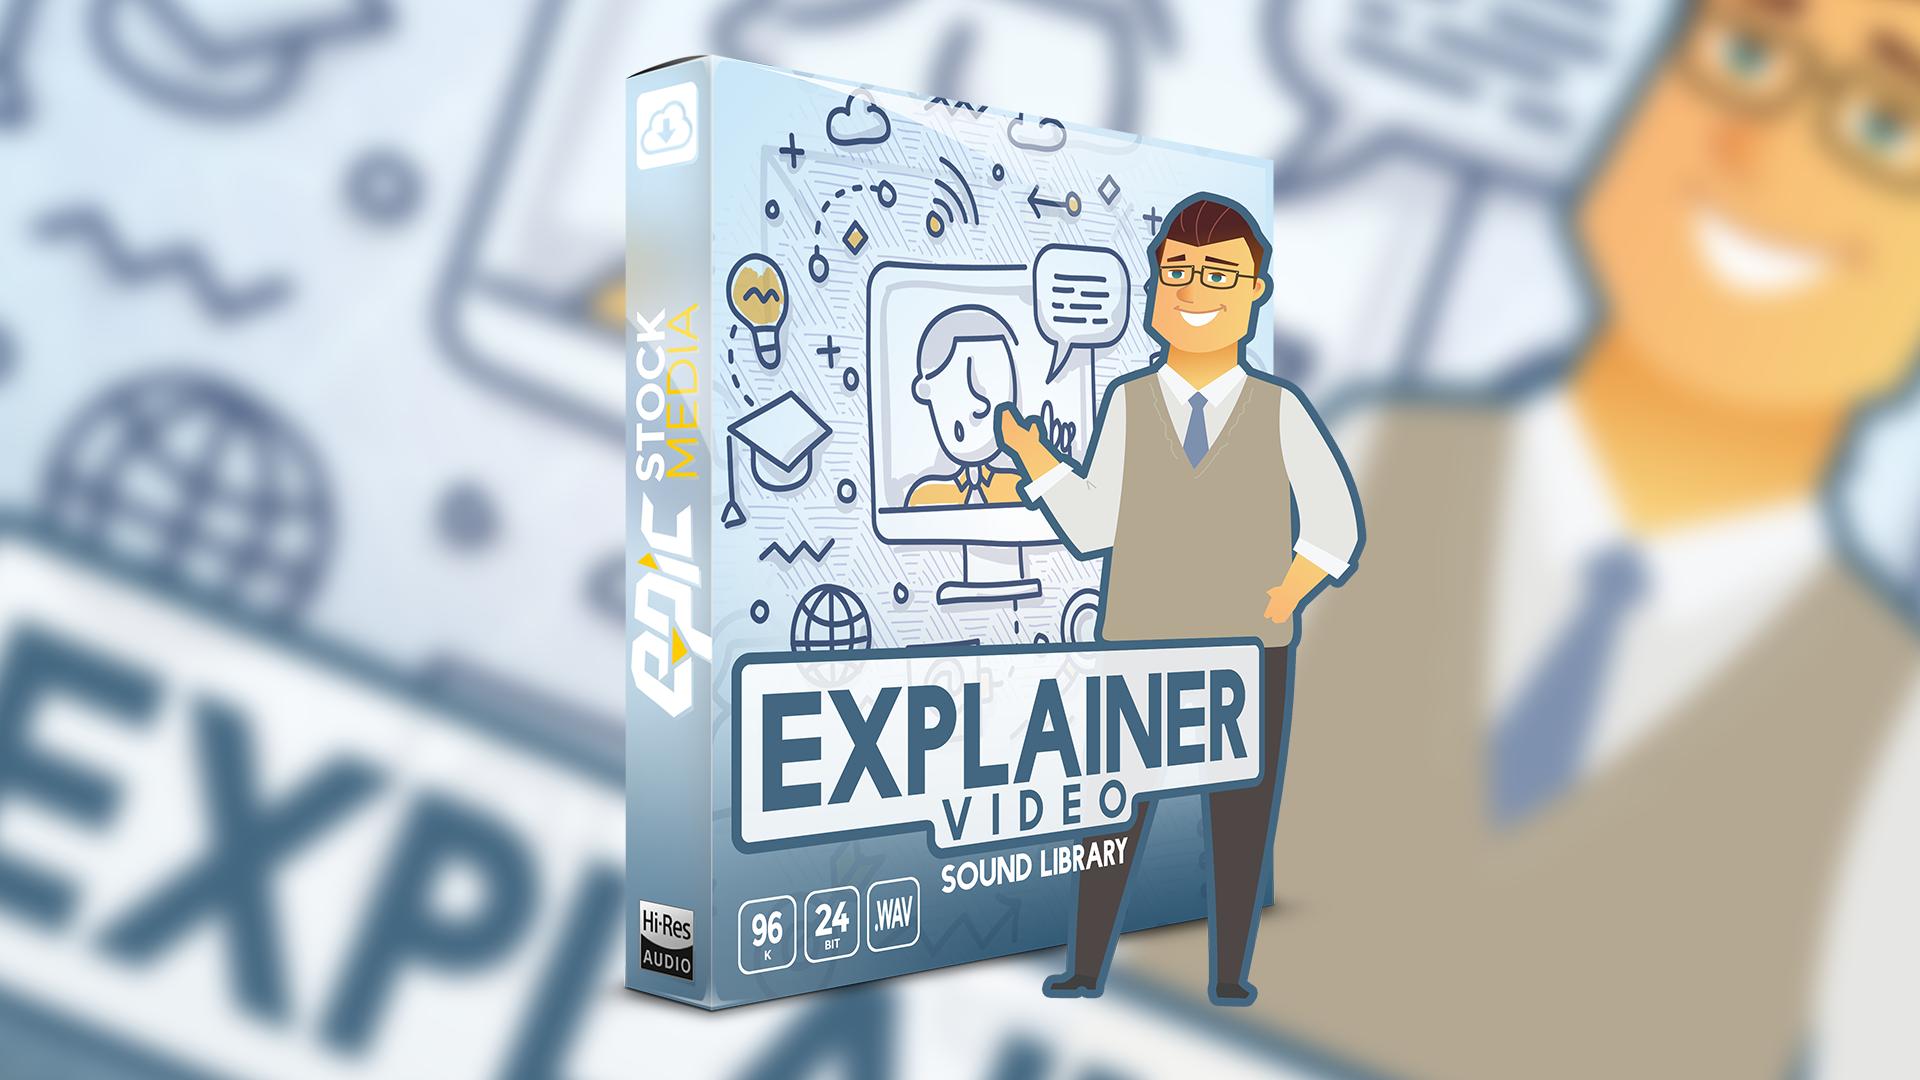 Explainer Video, 제작자 ESM Team, 카테고리 Sound Effects - UE4 마켓